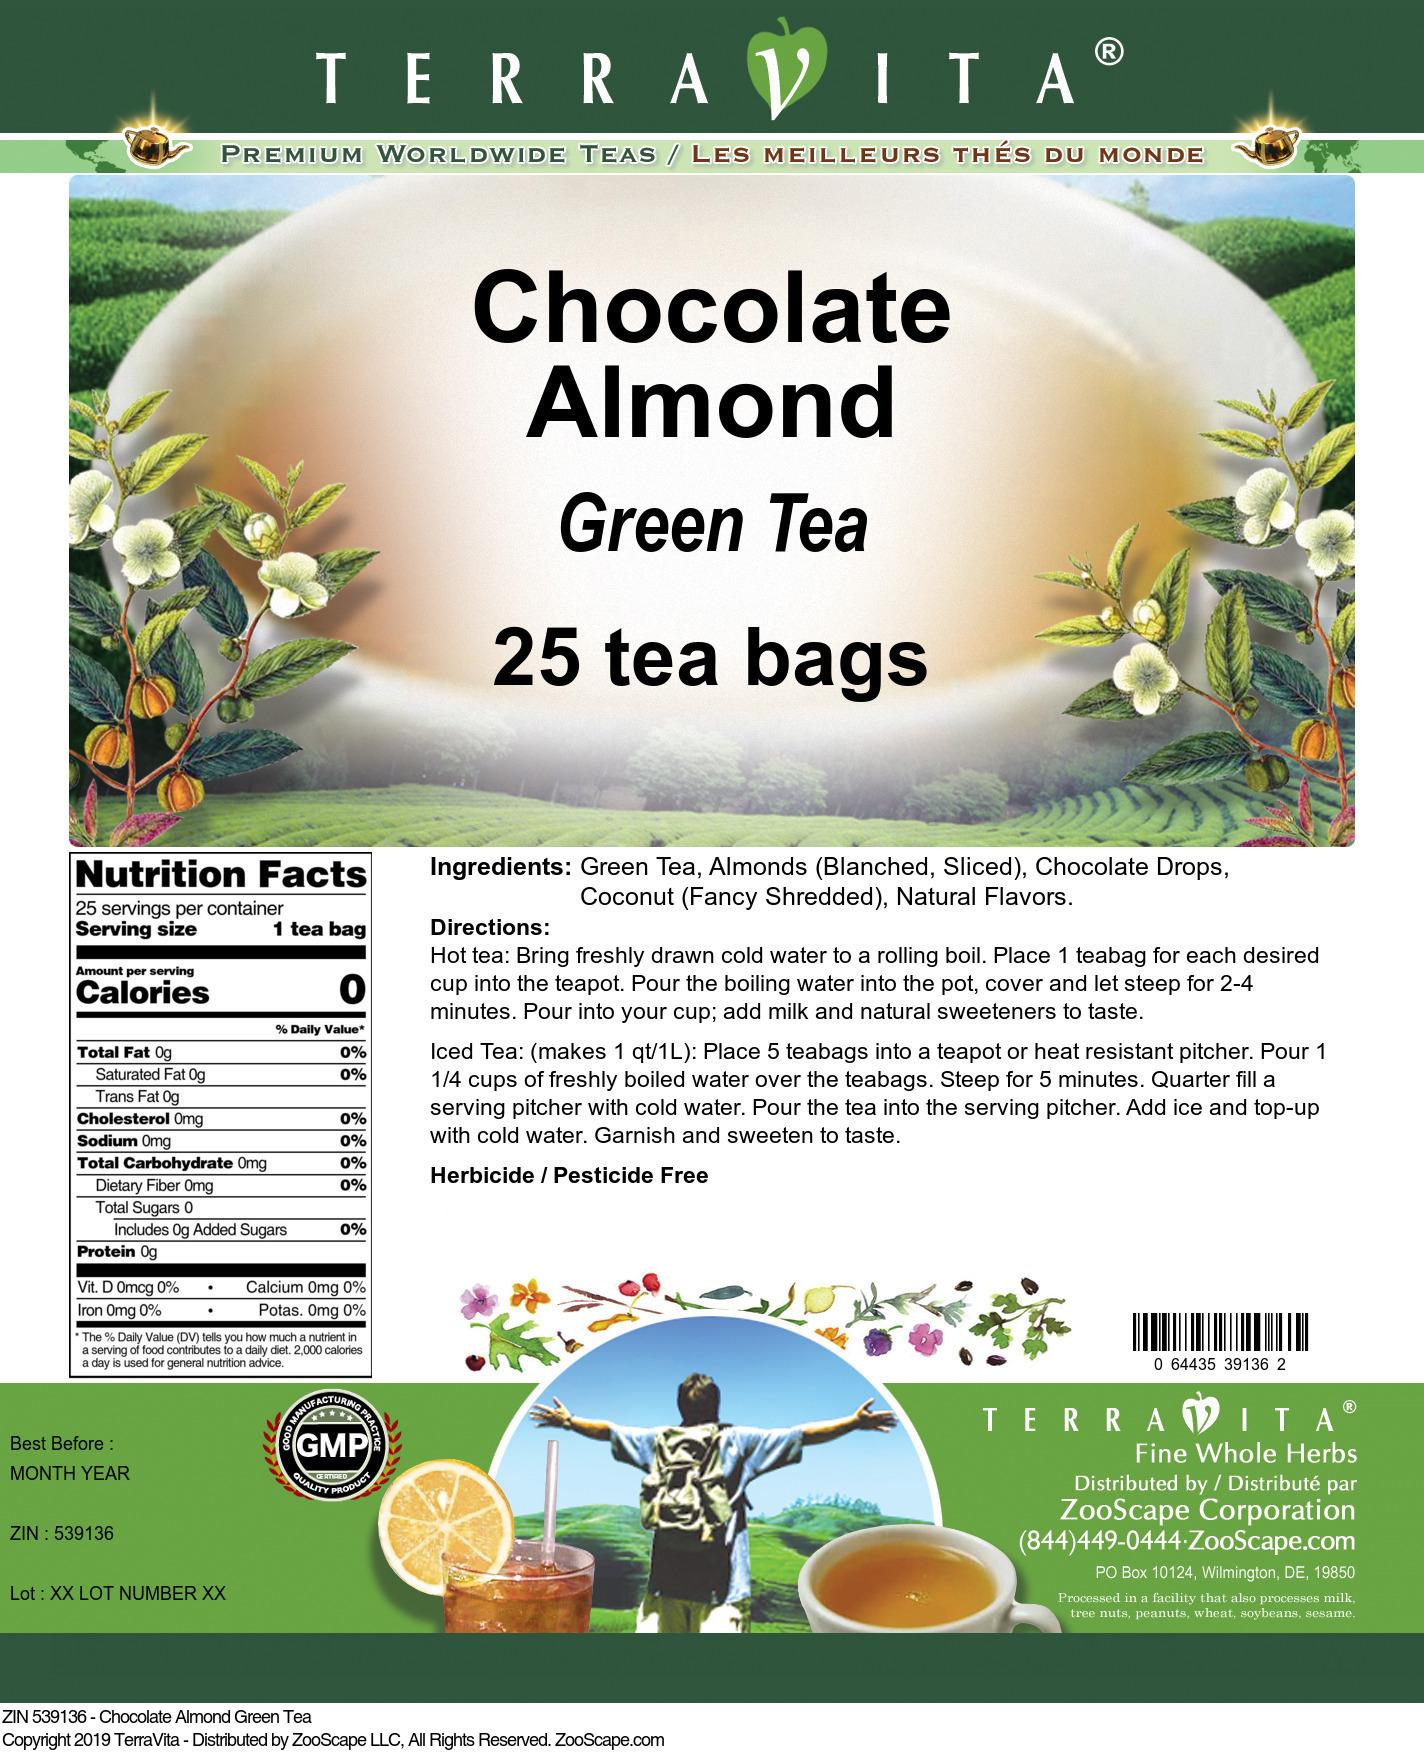 Chocolate Almond Green Tea